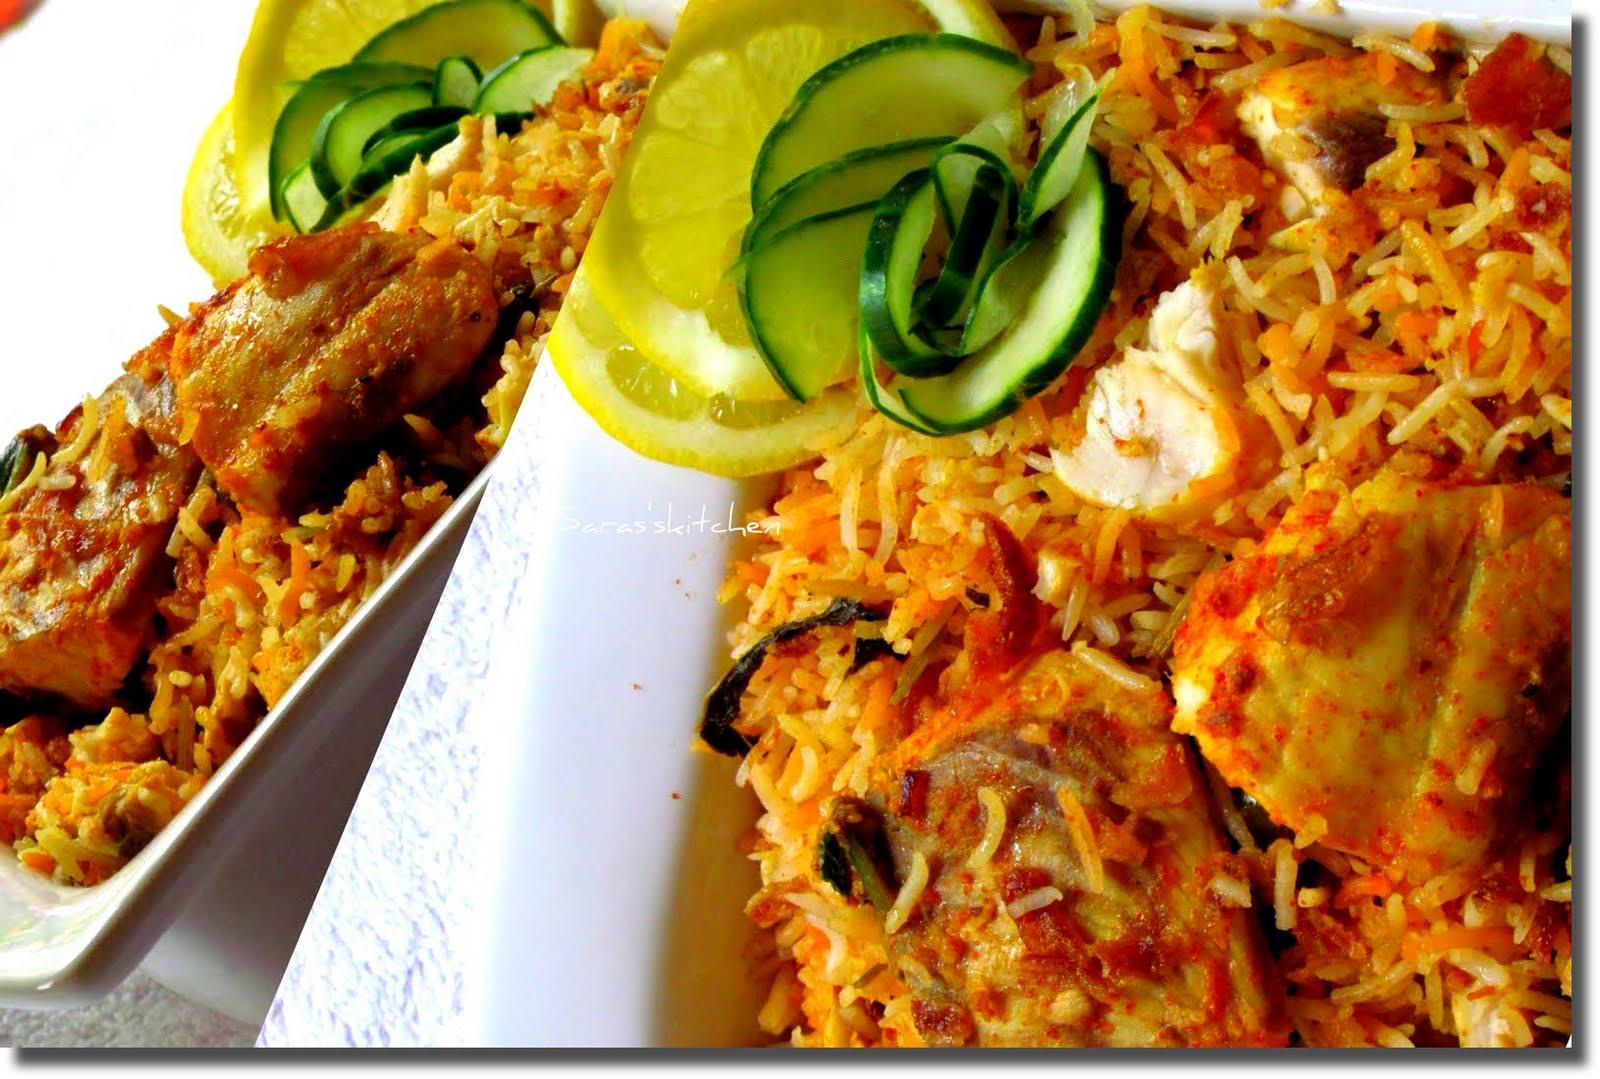 Fish dum briyani